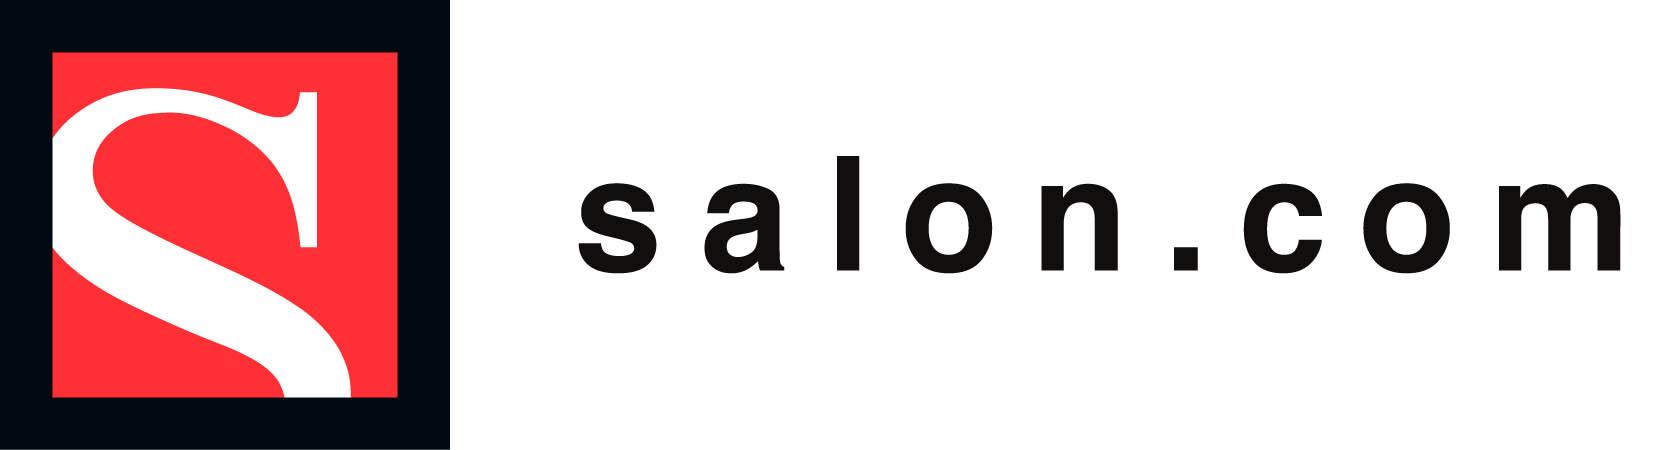 salon-com.jpg